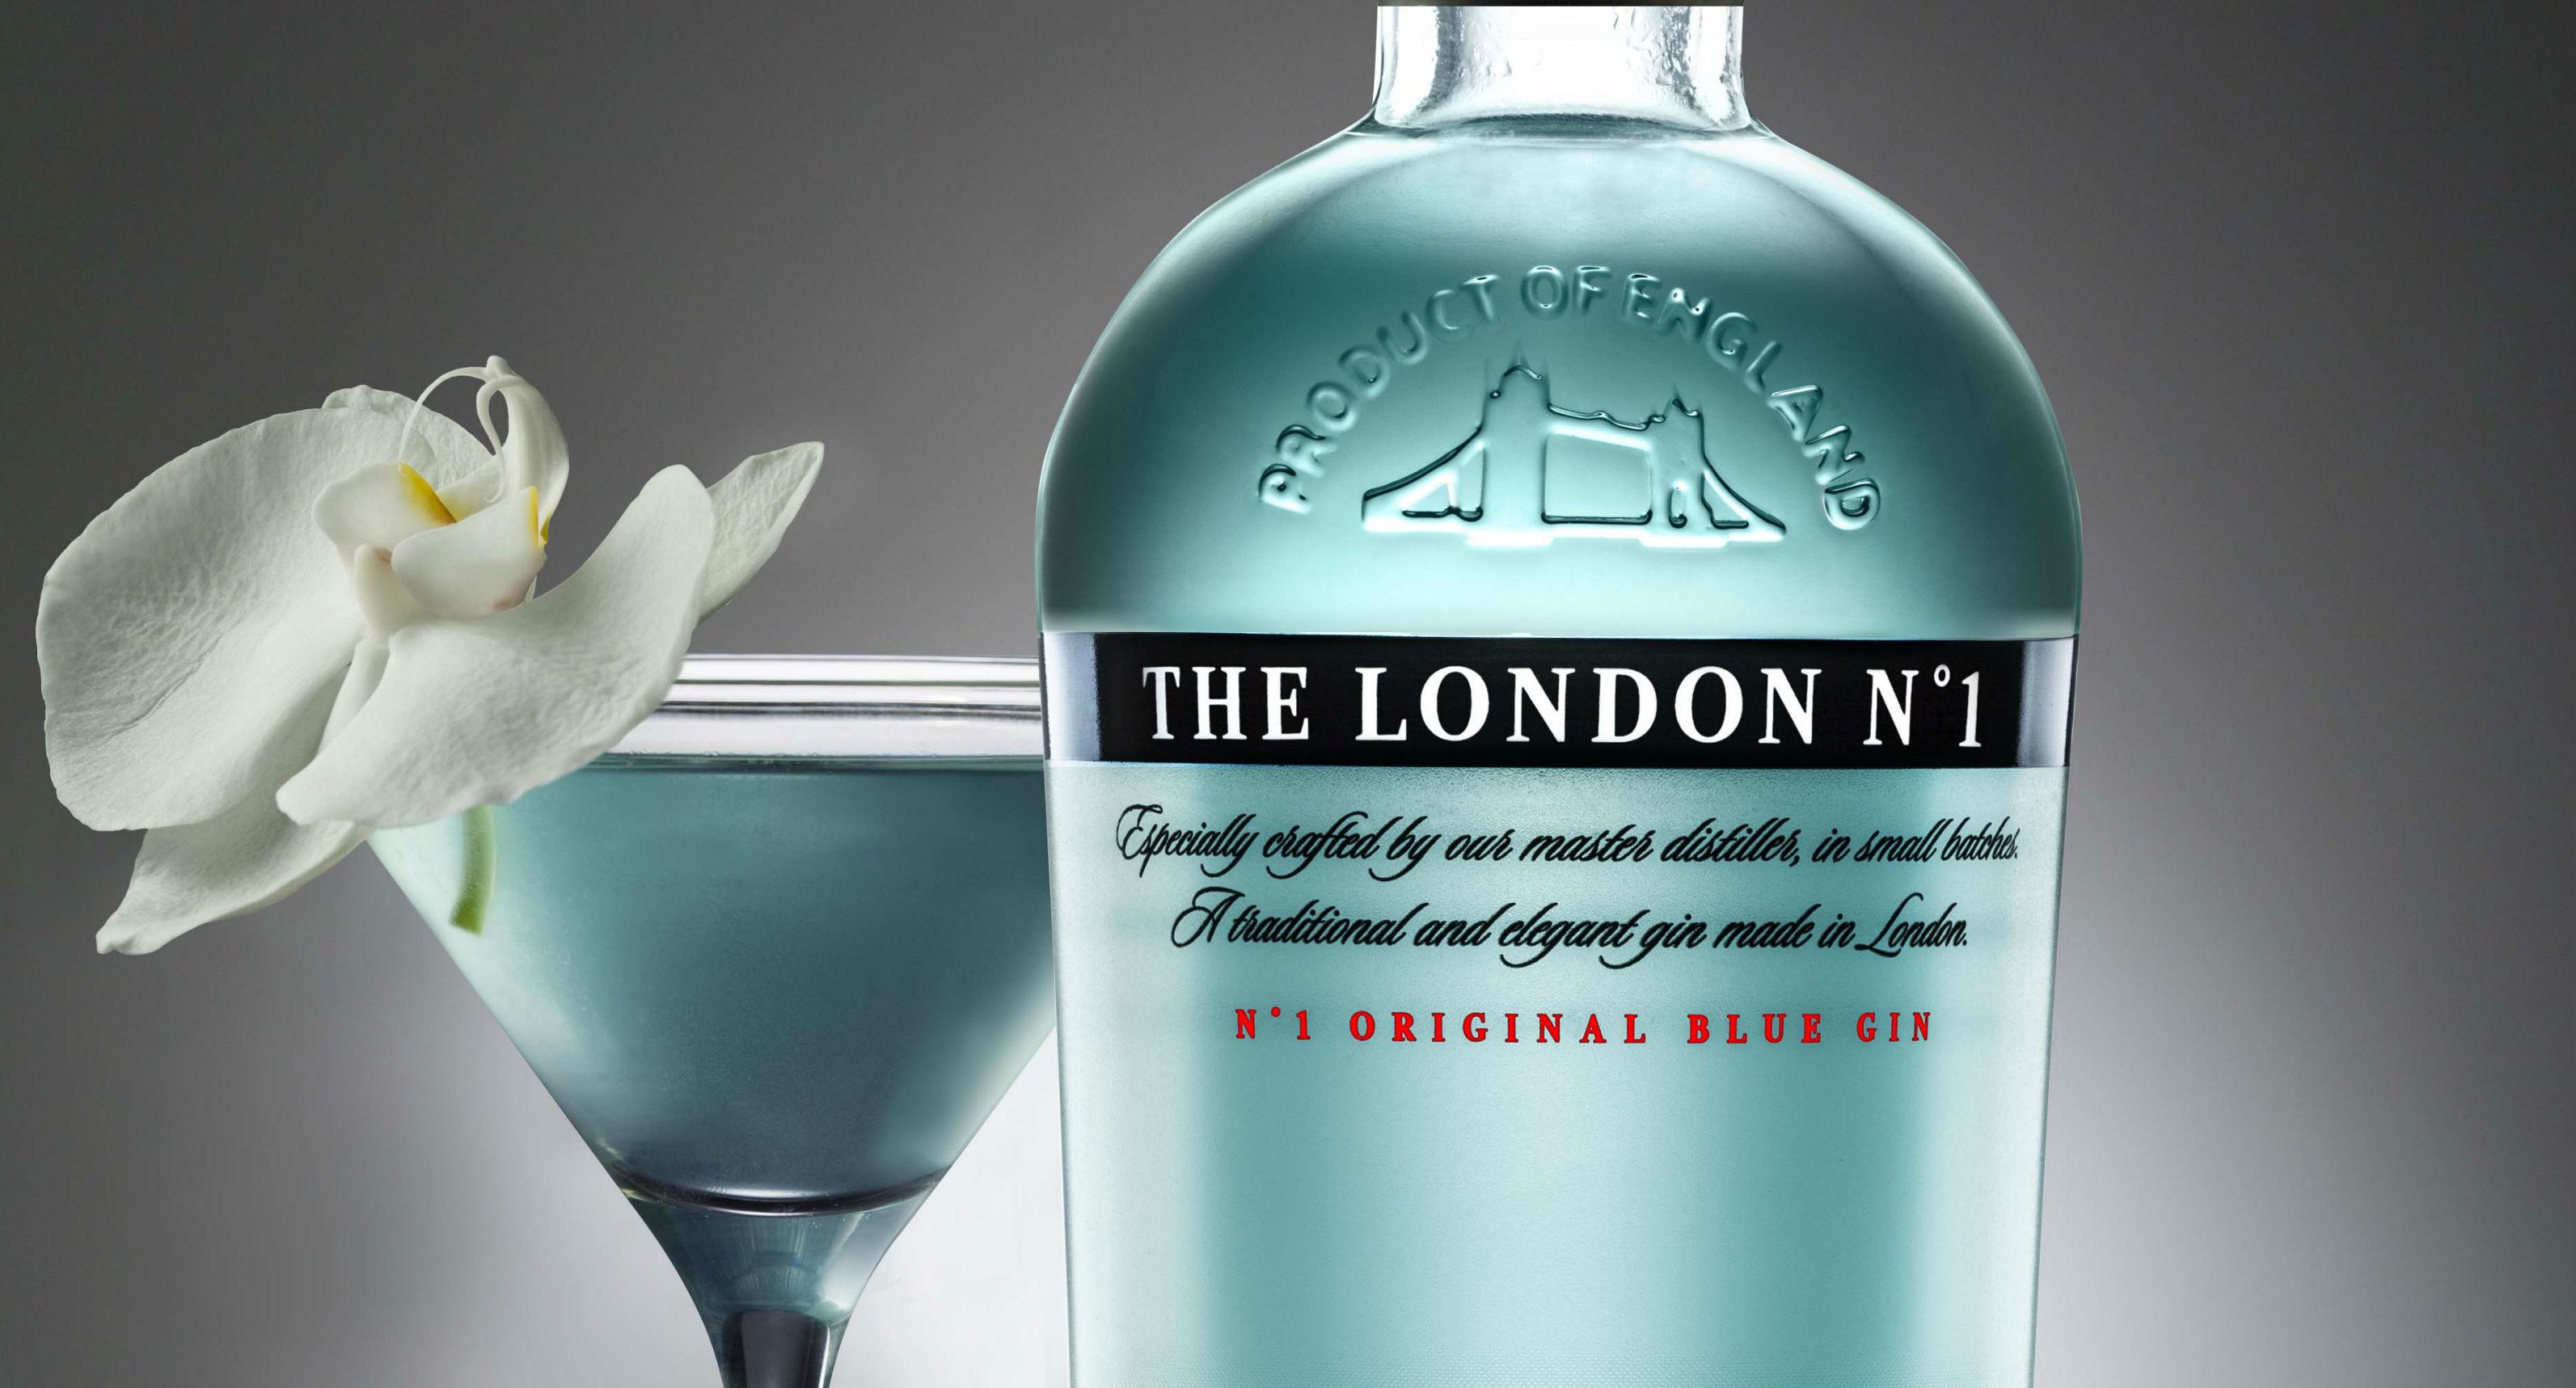 The London N1